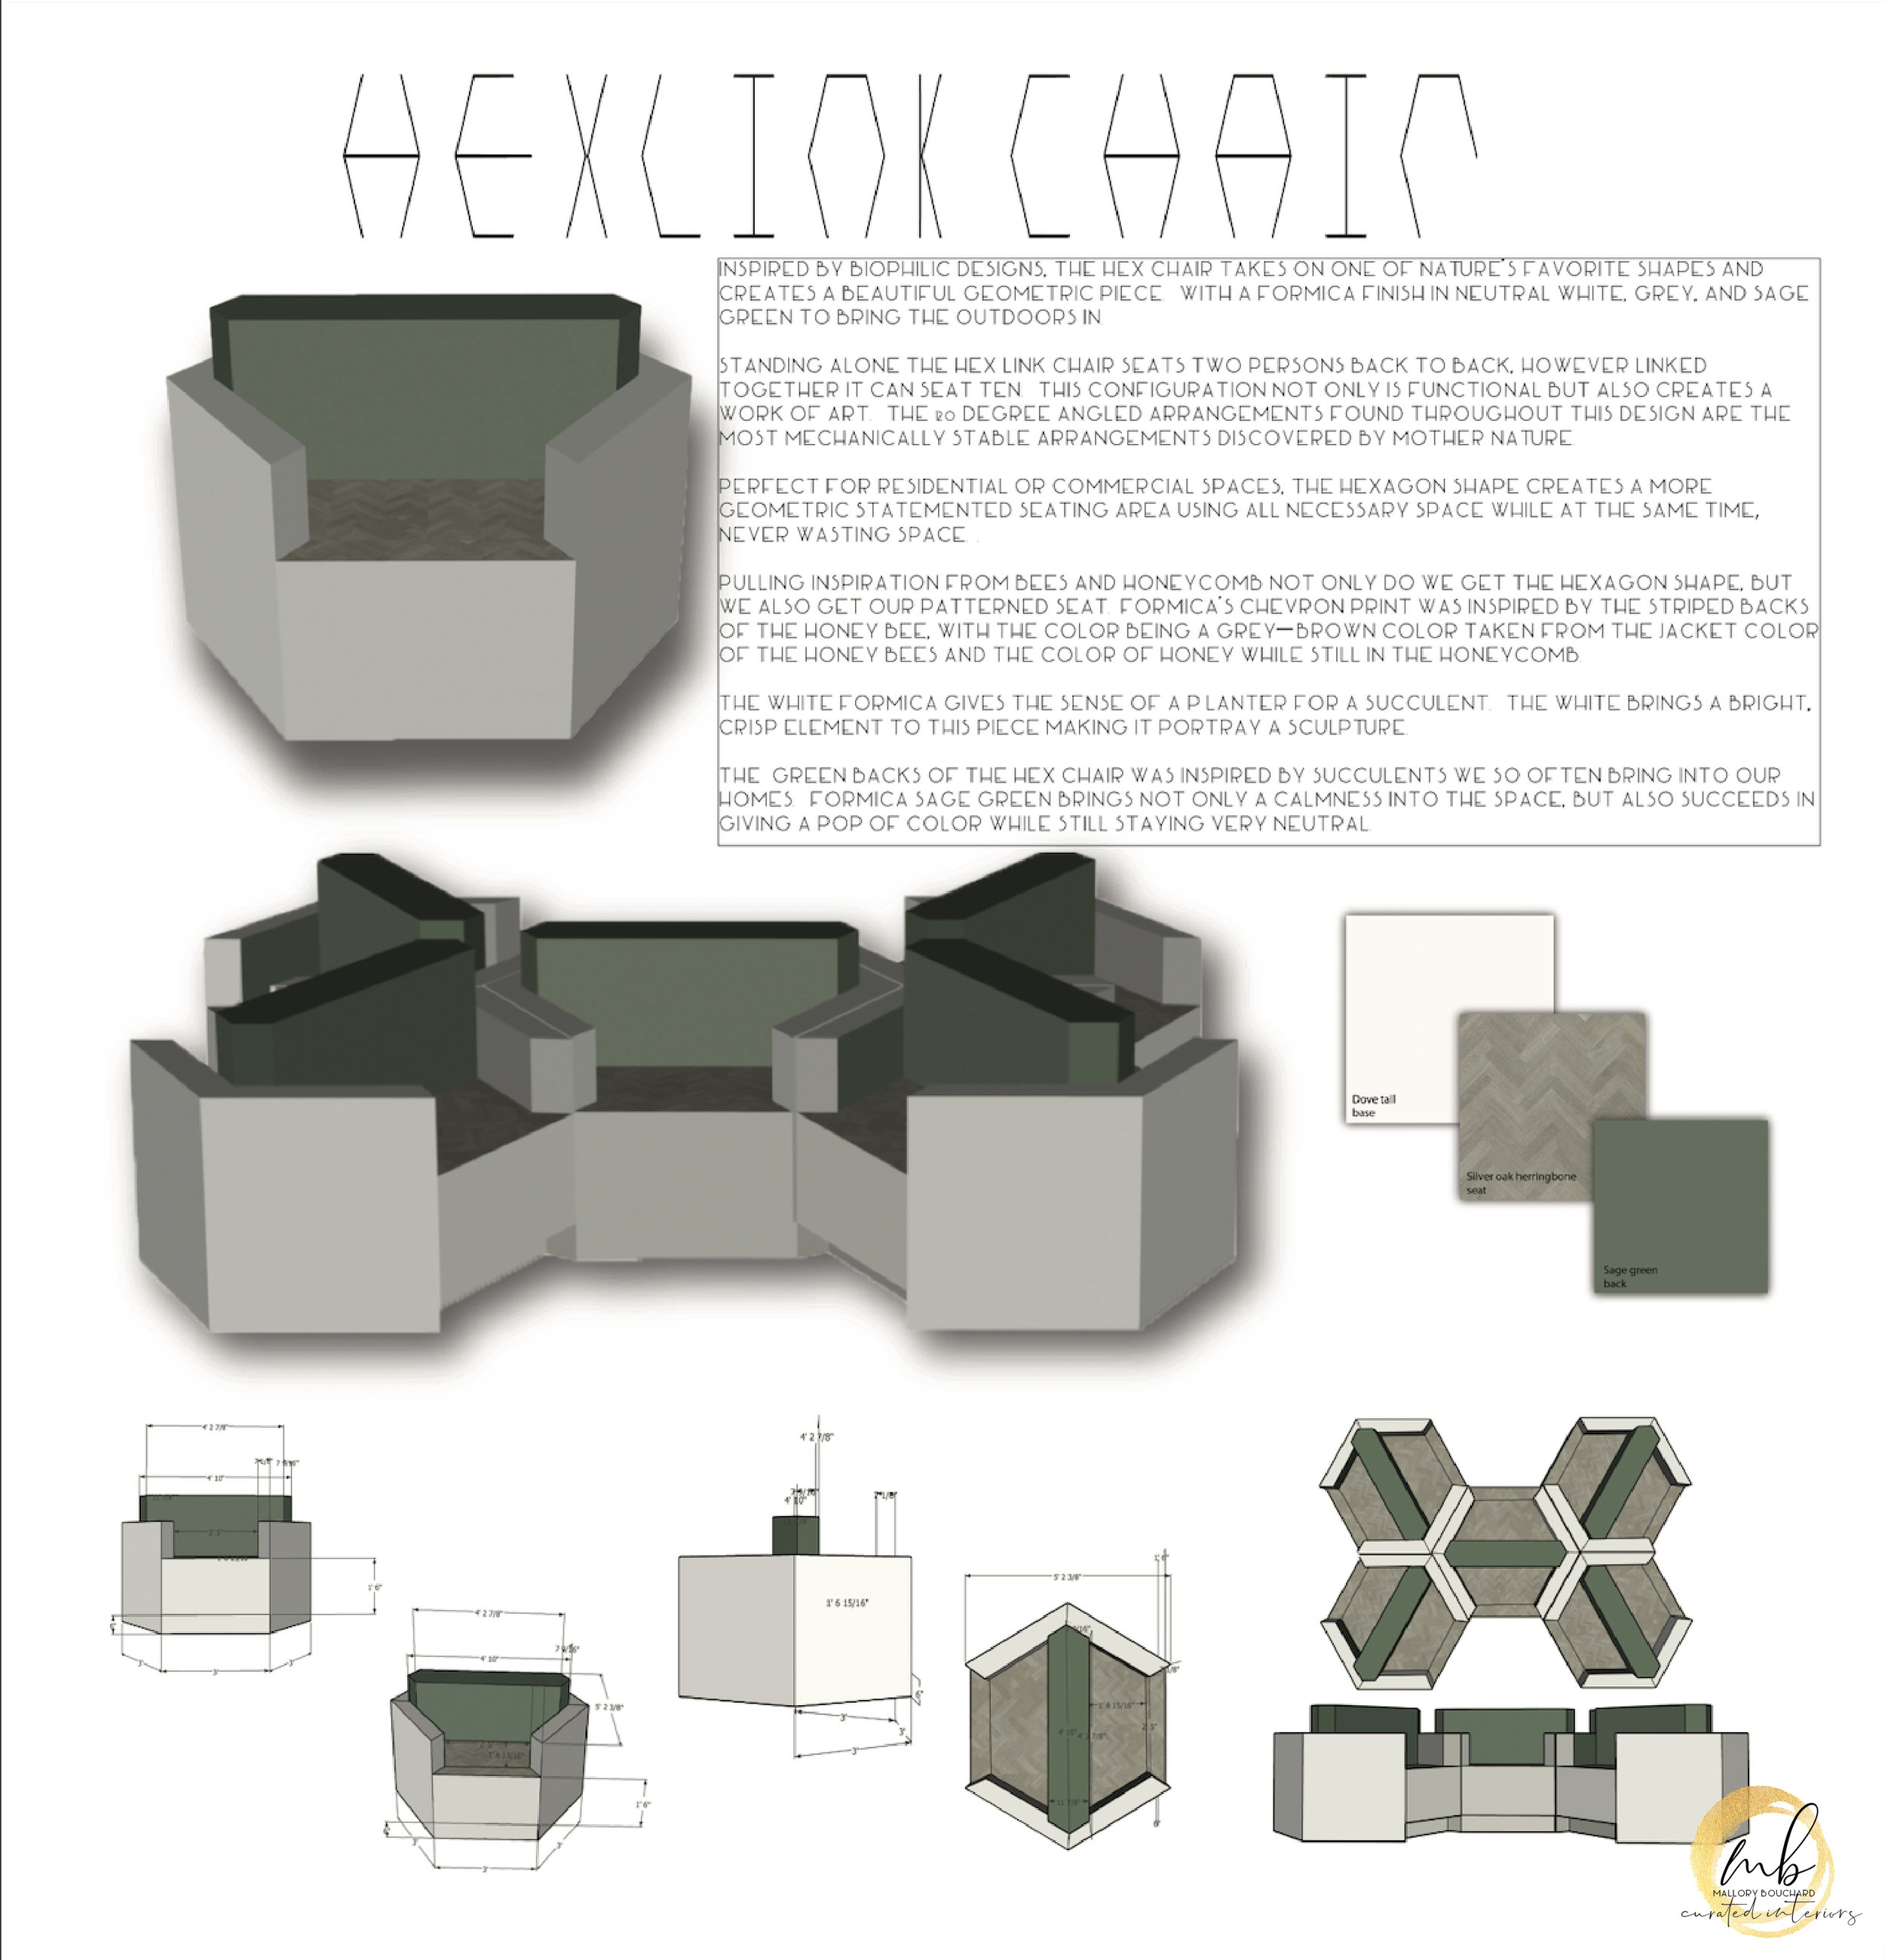 hexlink chair poster.jpg